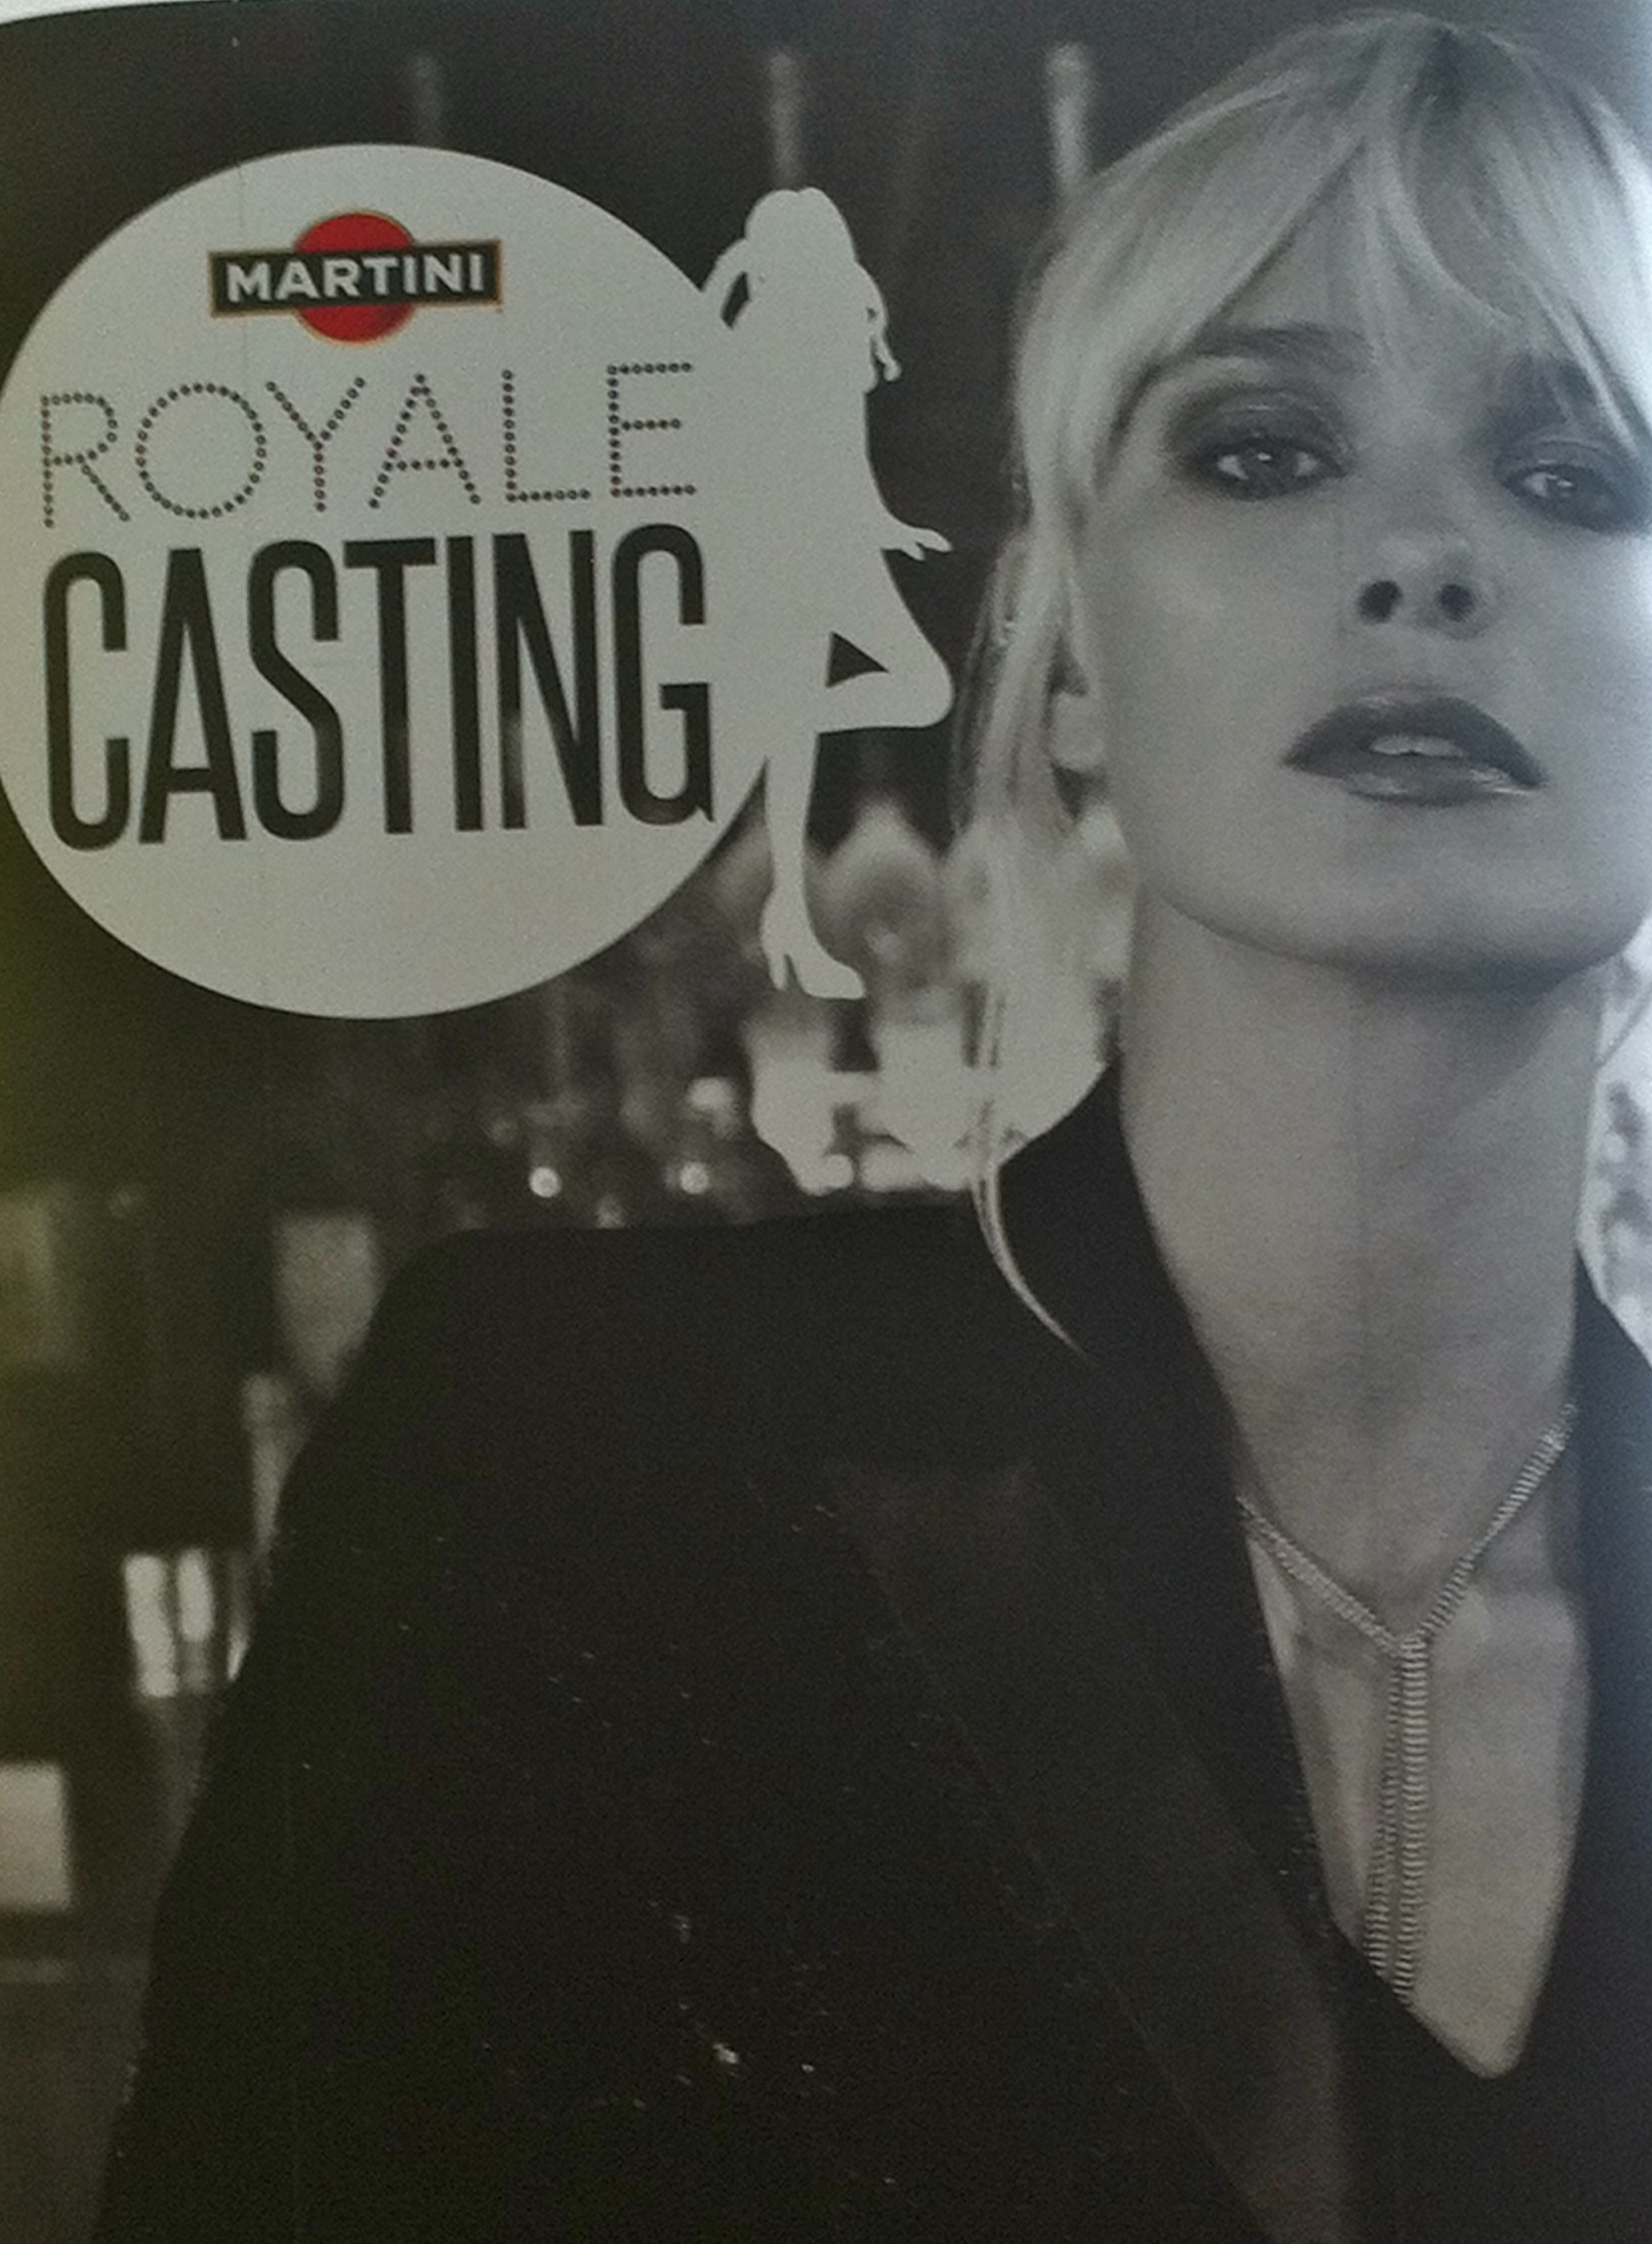 Martini Royale casting